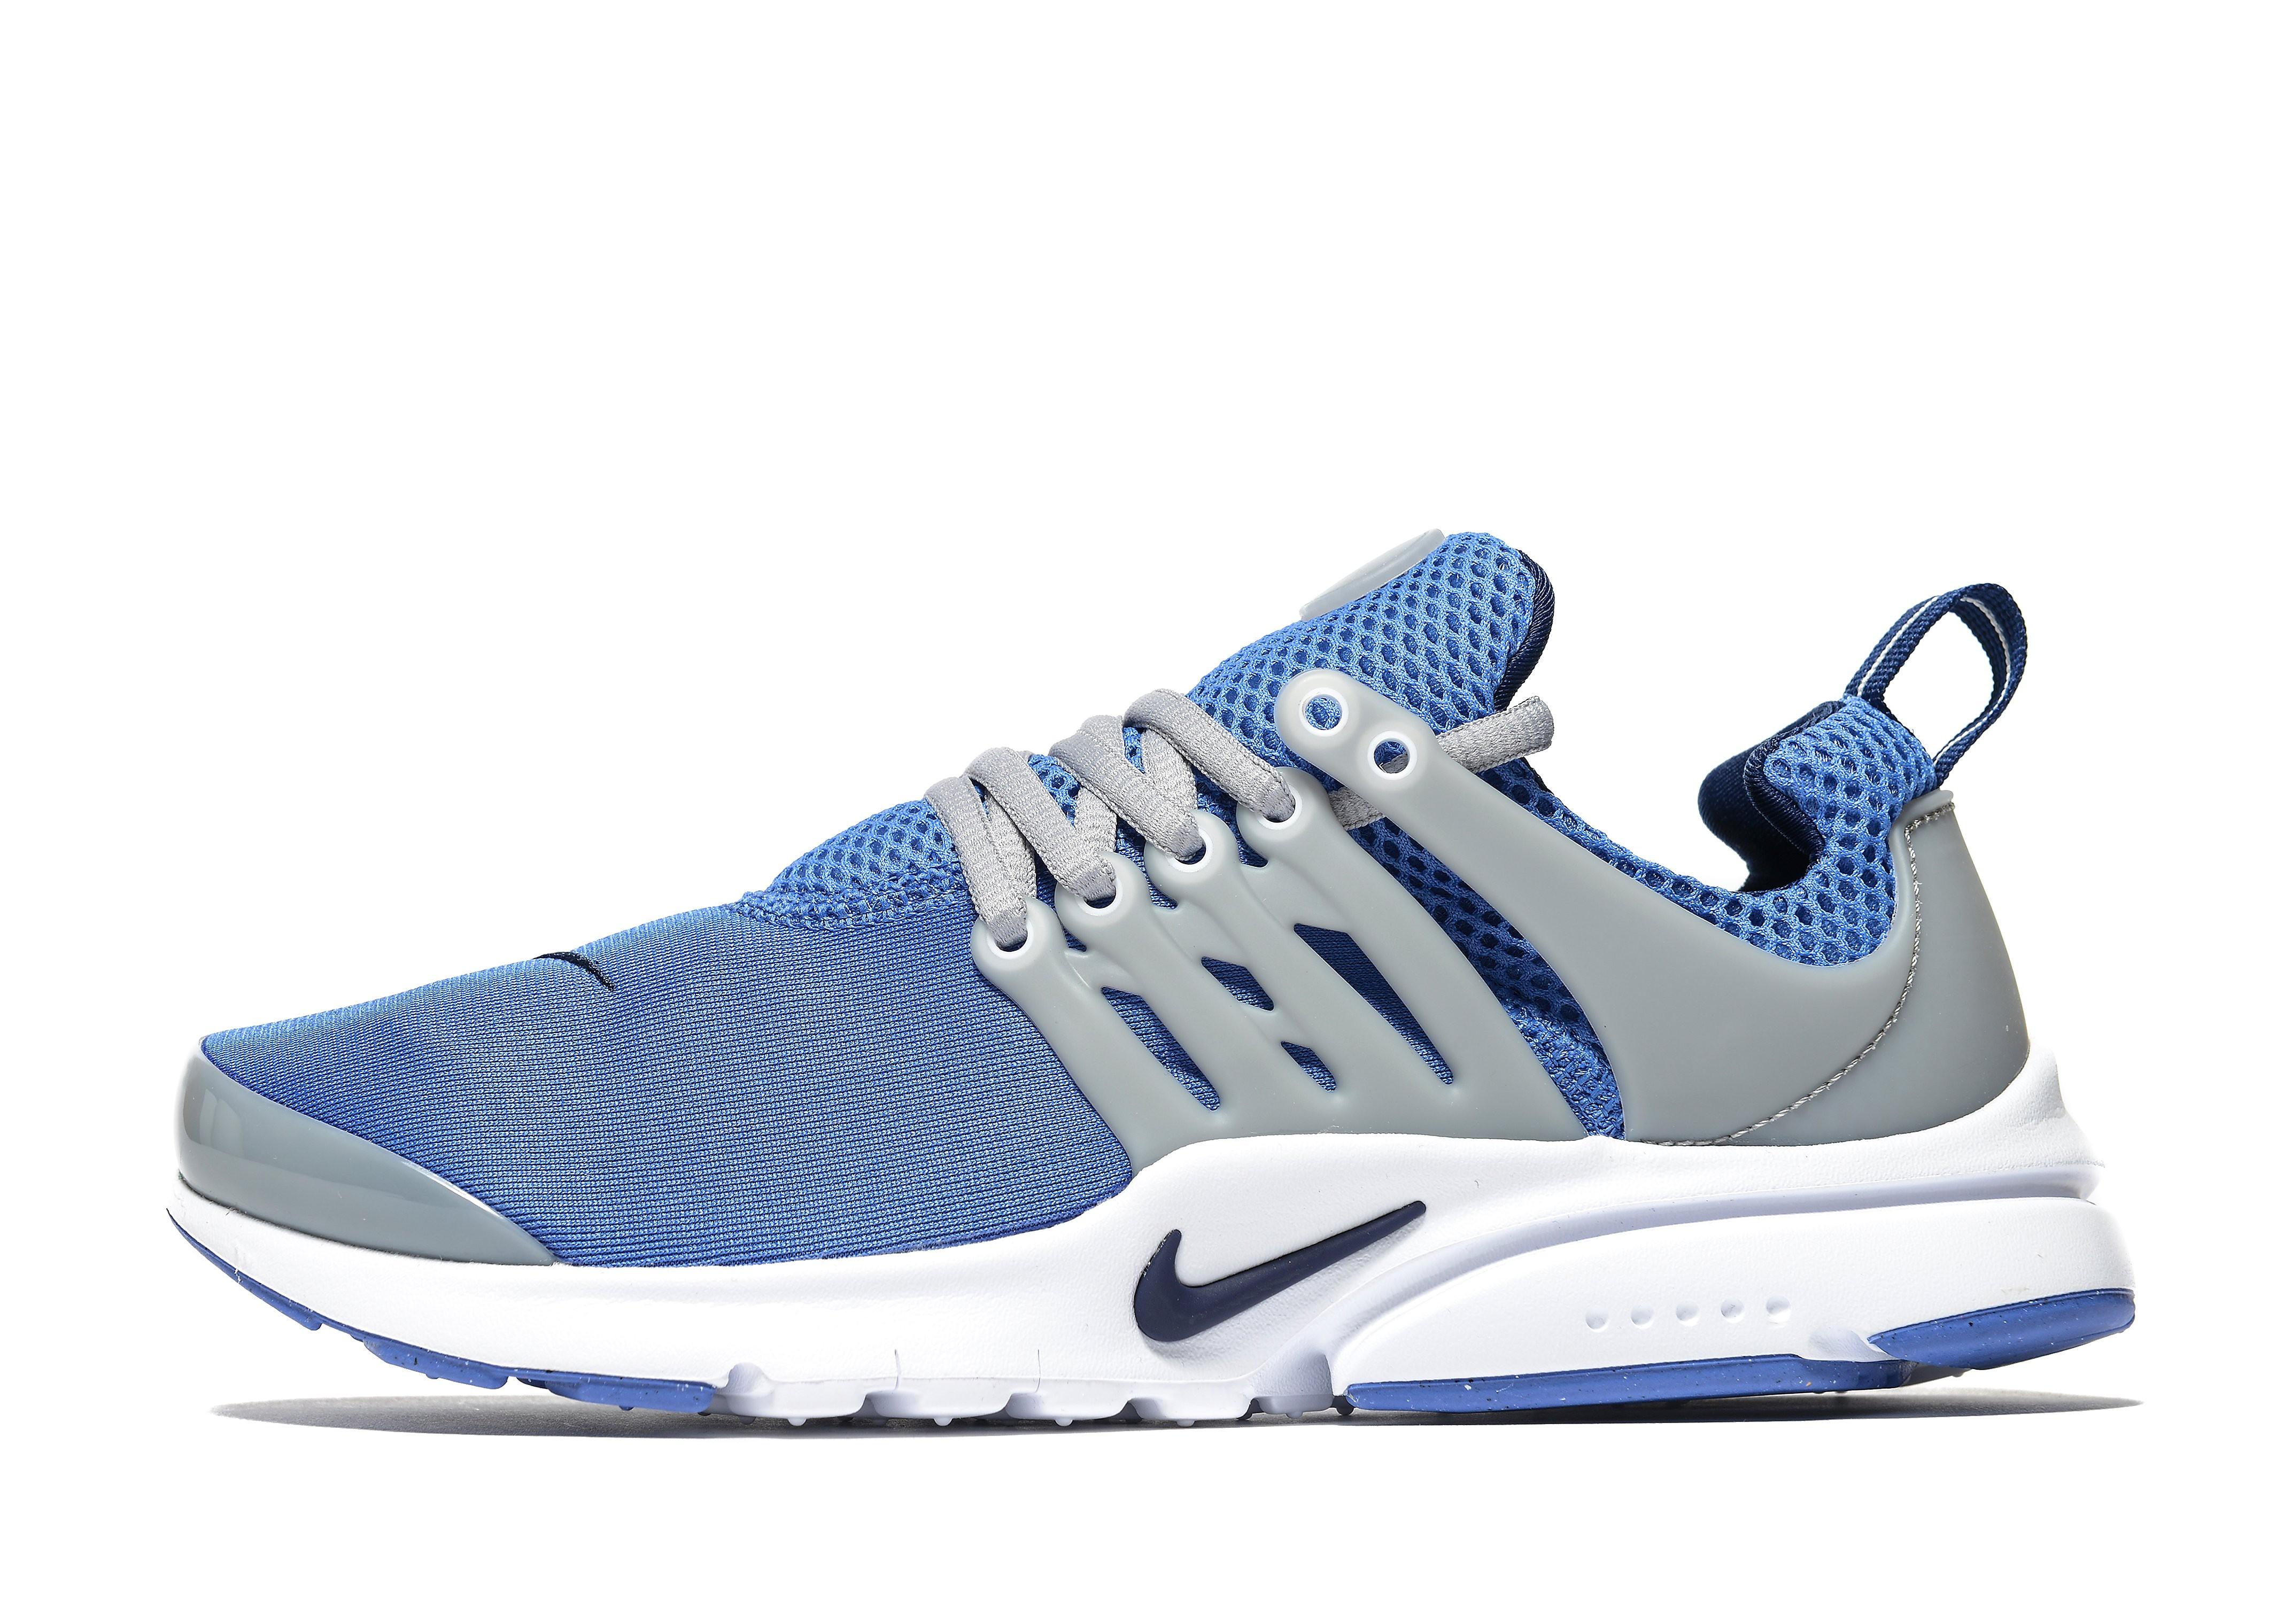 Nike Air Presto Junior